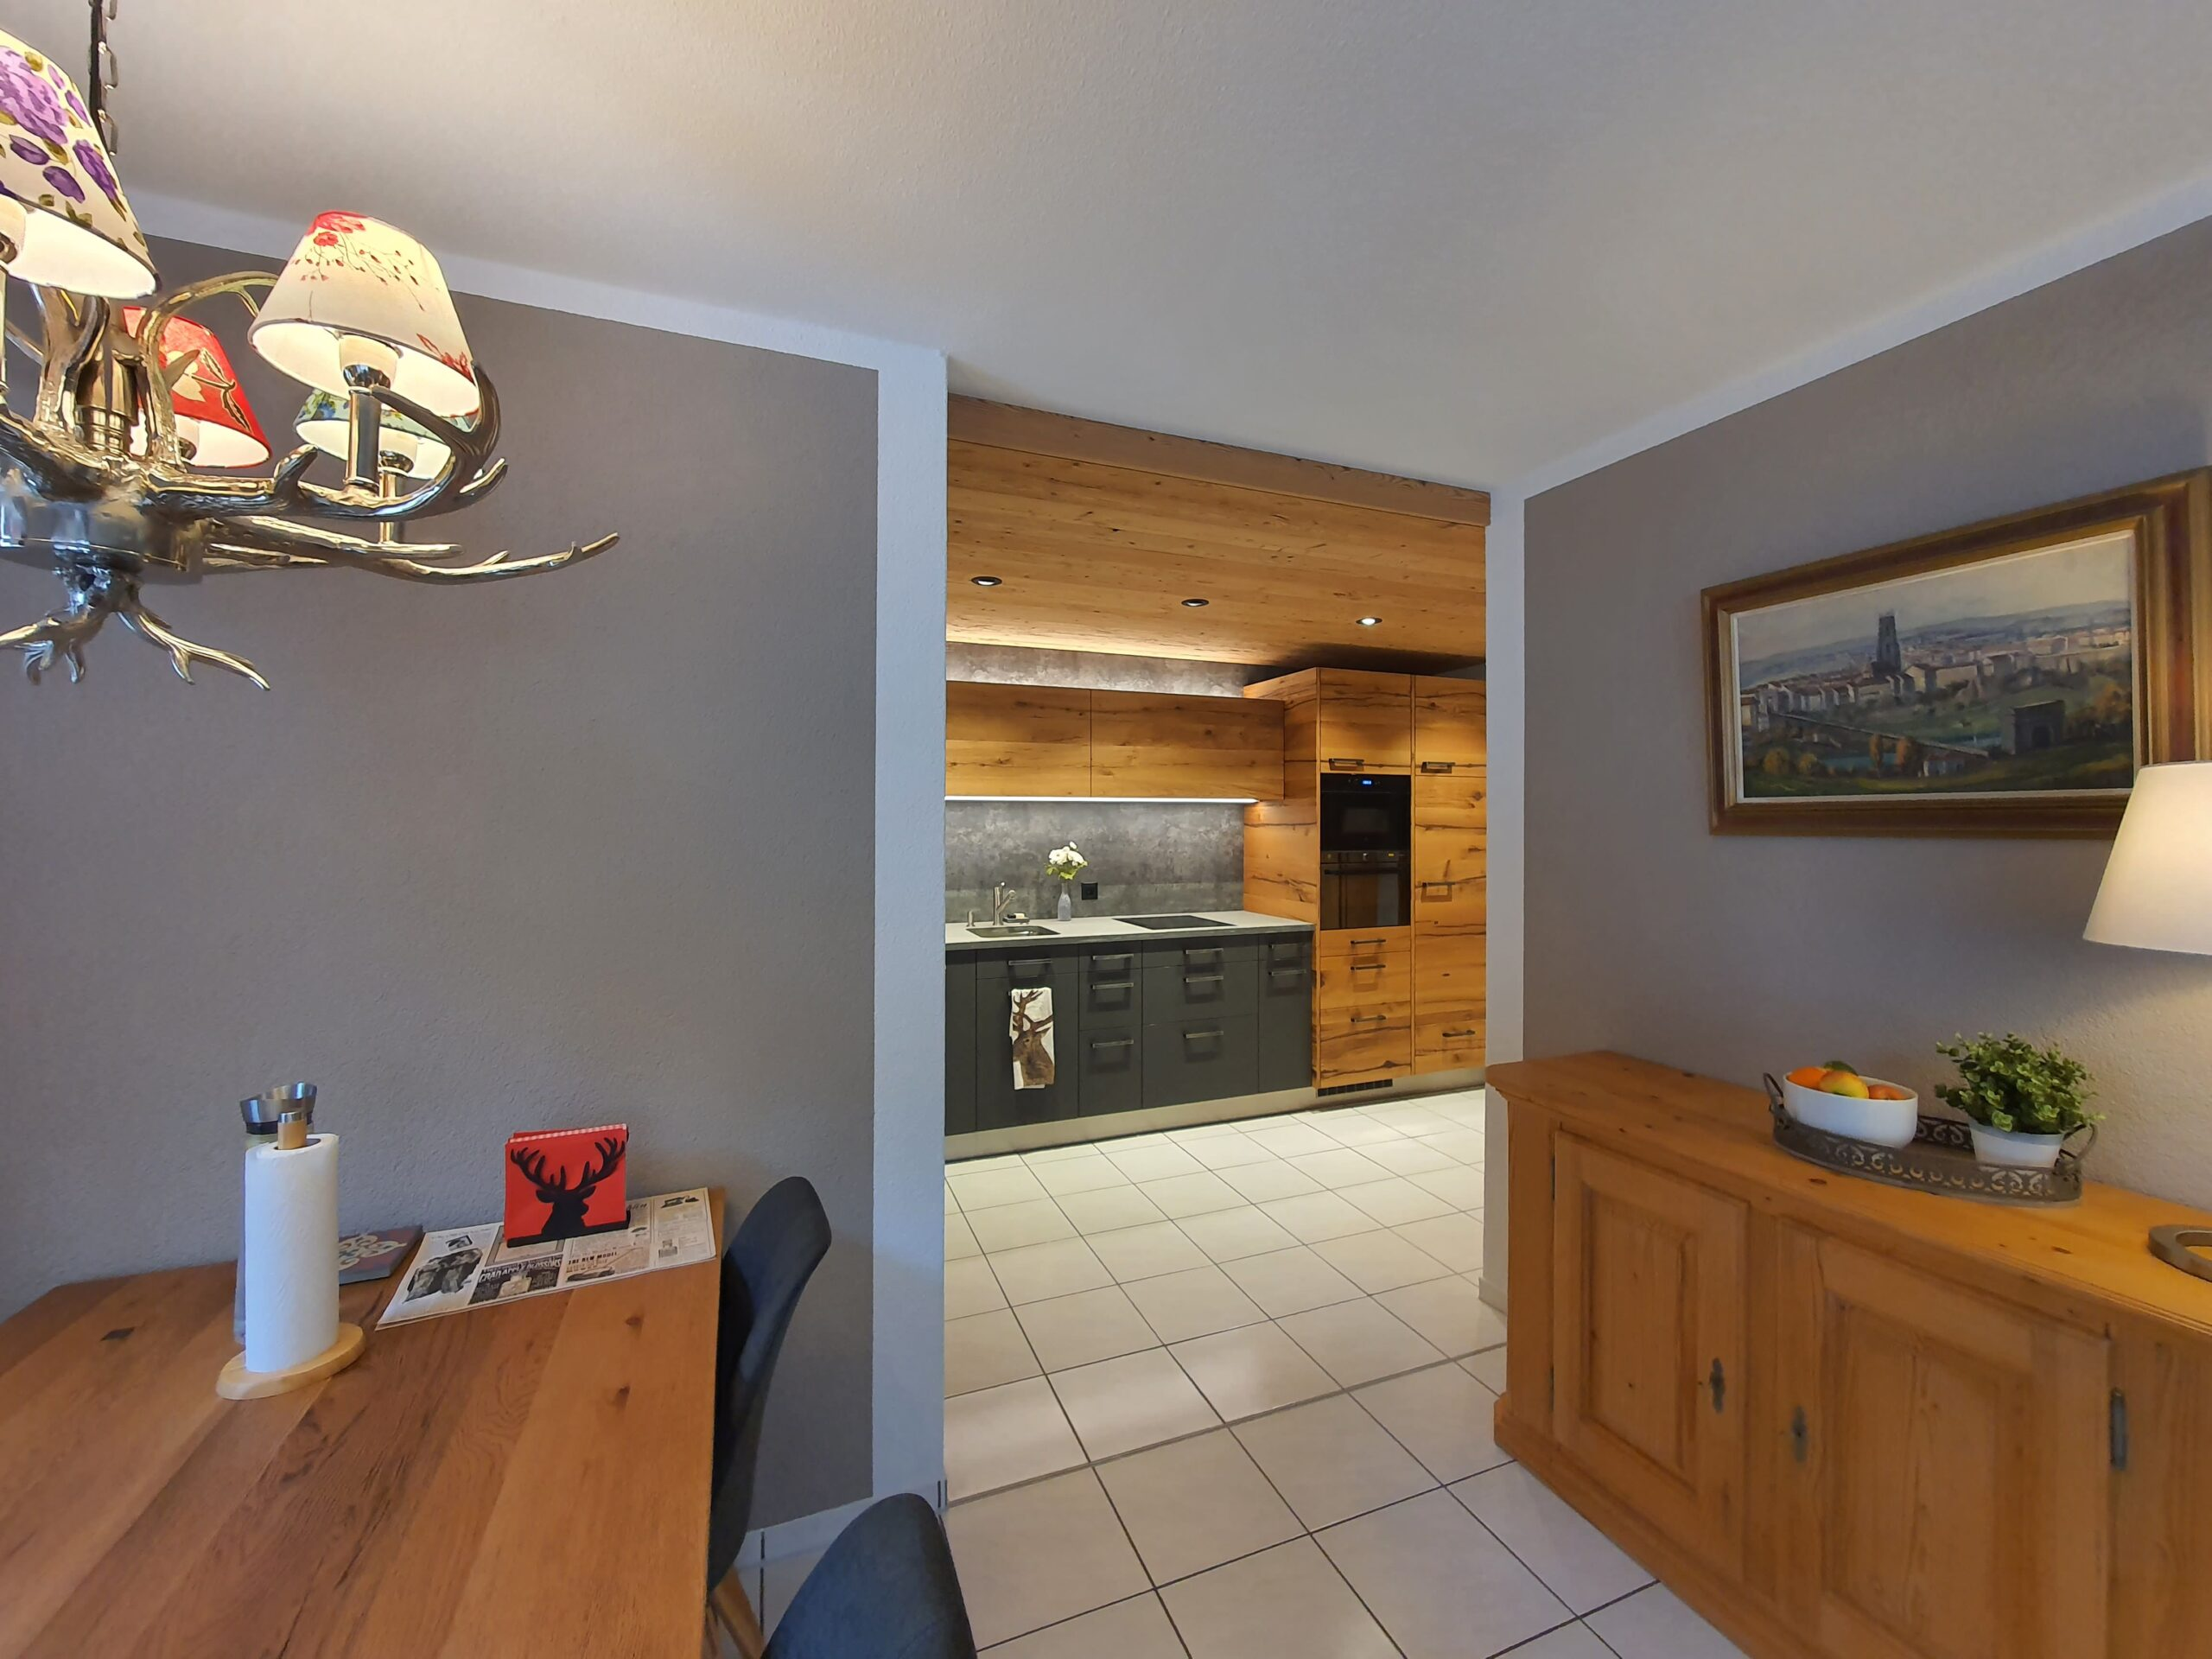 Wooddesign_Holzdesign_Küche aus Altholz_Eiche Altholz_modern_rustikal_LED-Beleuchtung_Ferienwohnung_anthrazit_Altholzdecke (3)